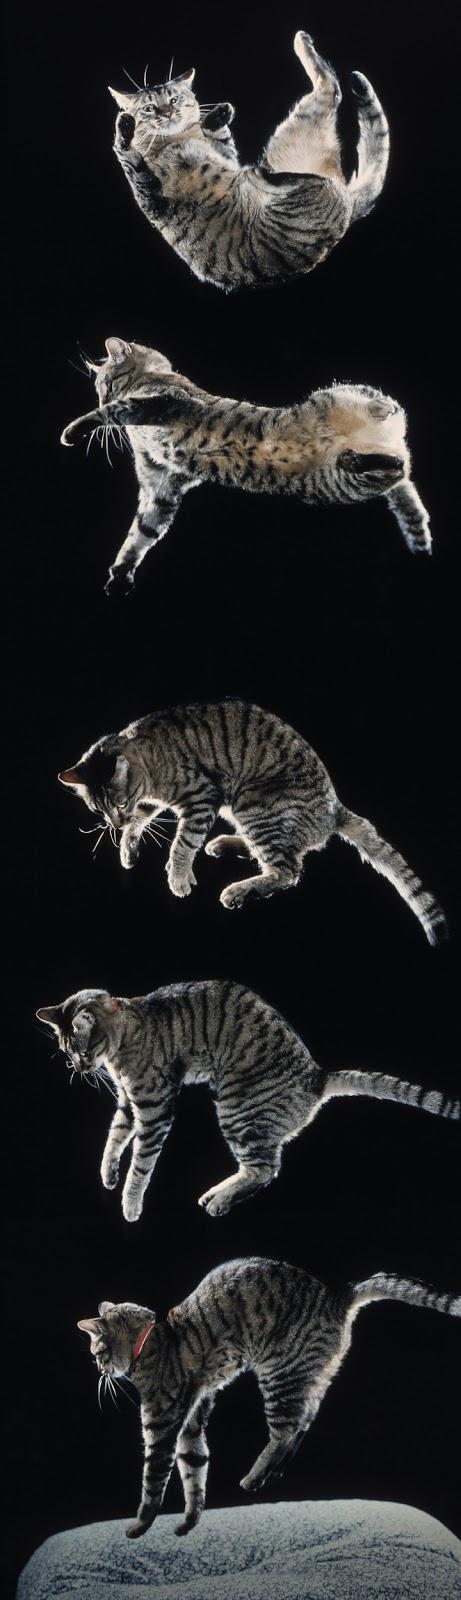 Феномен падающей кошки